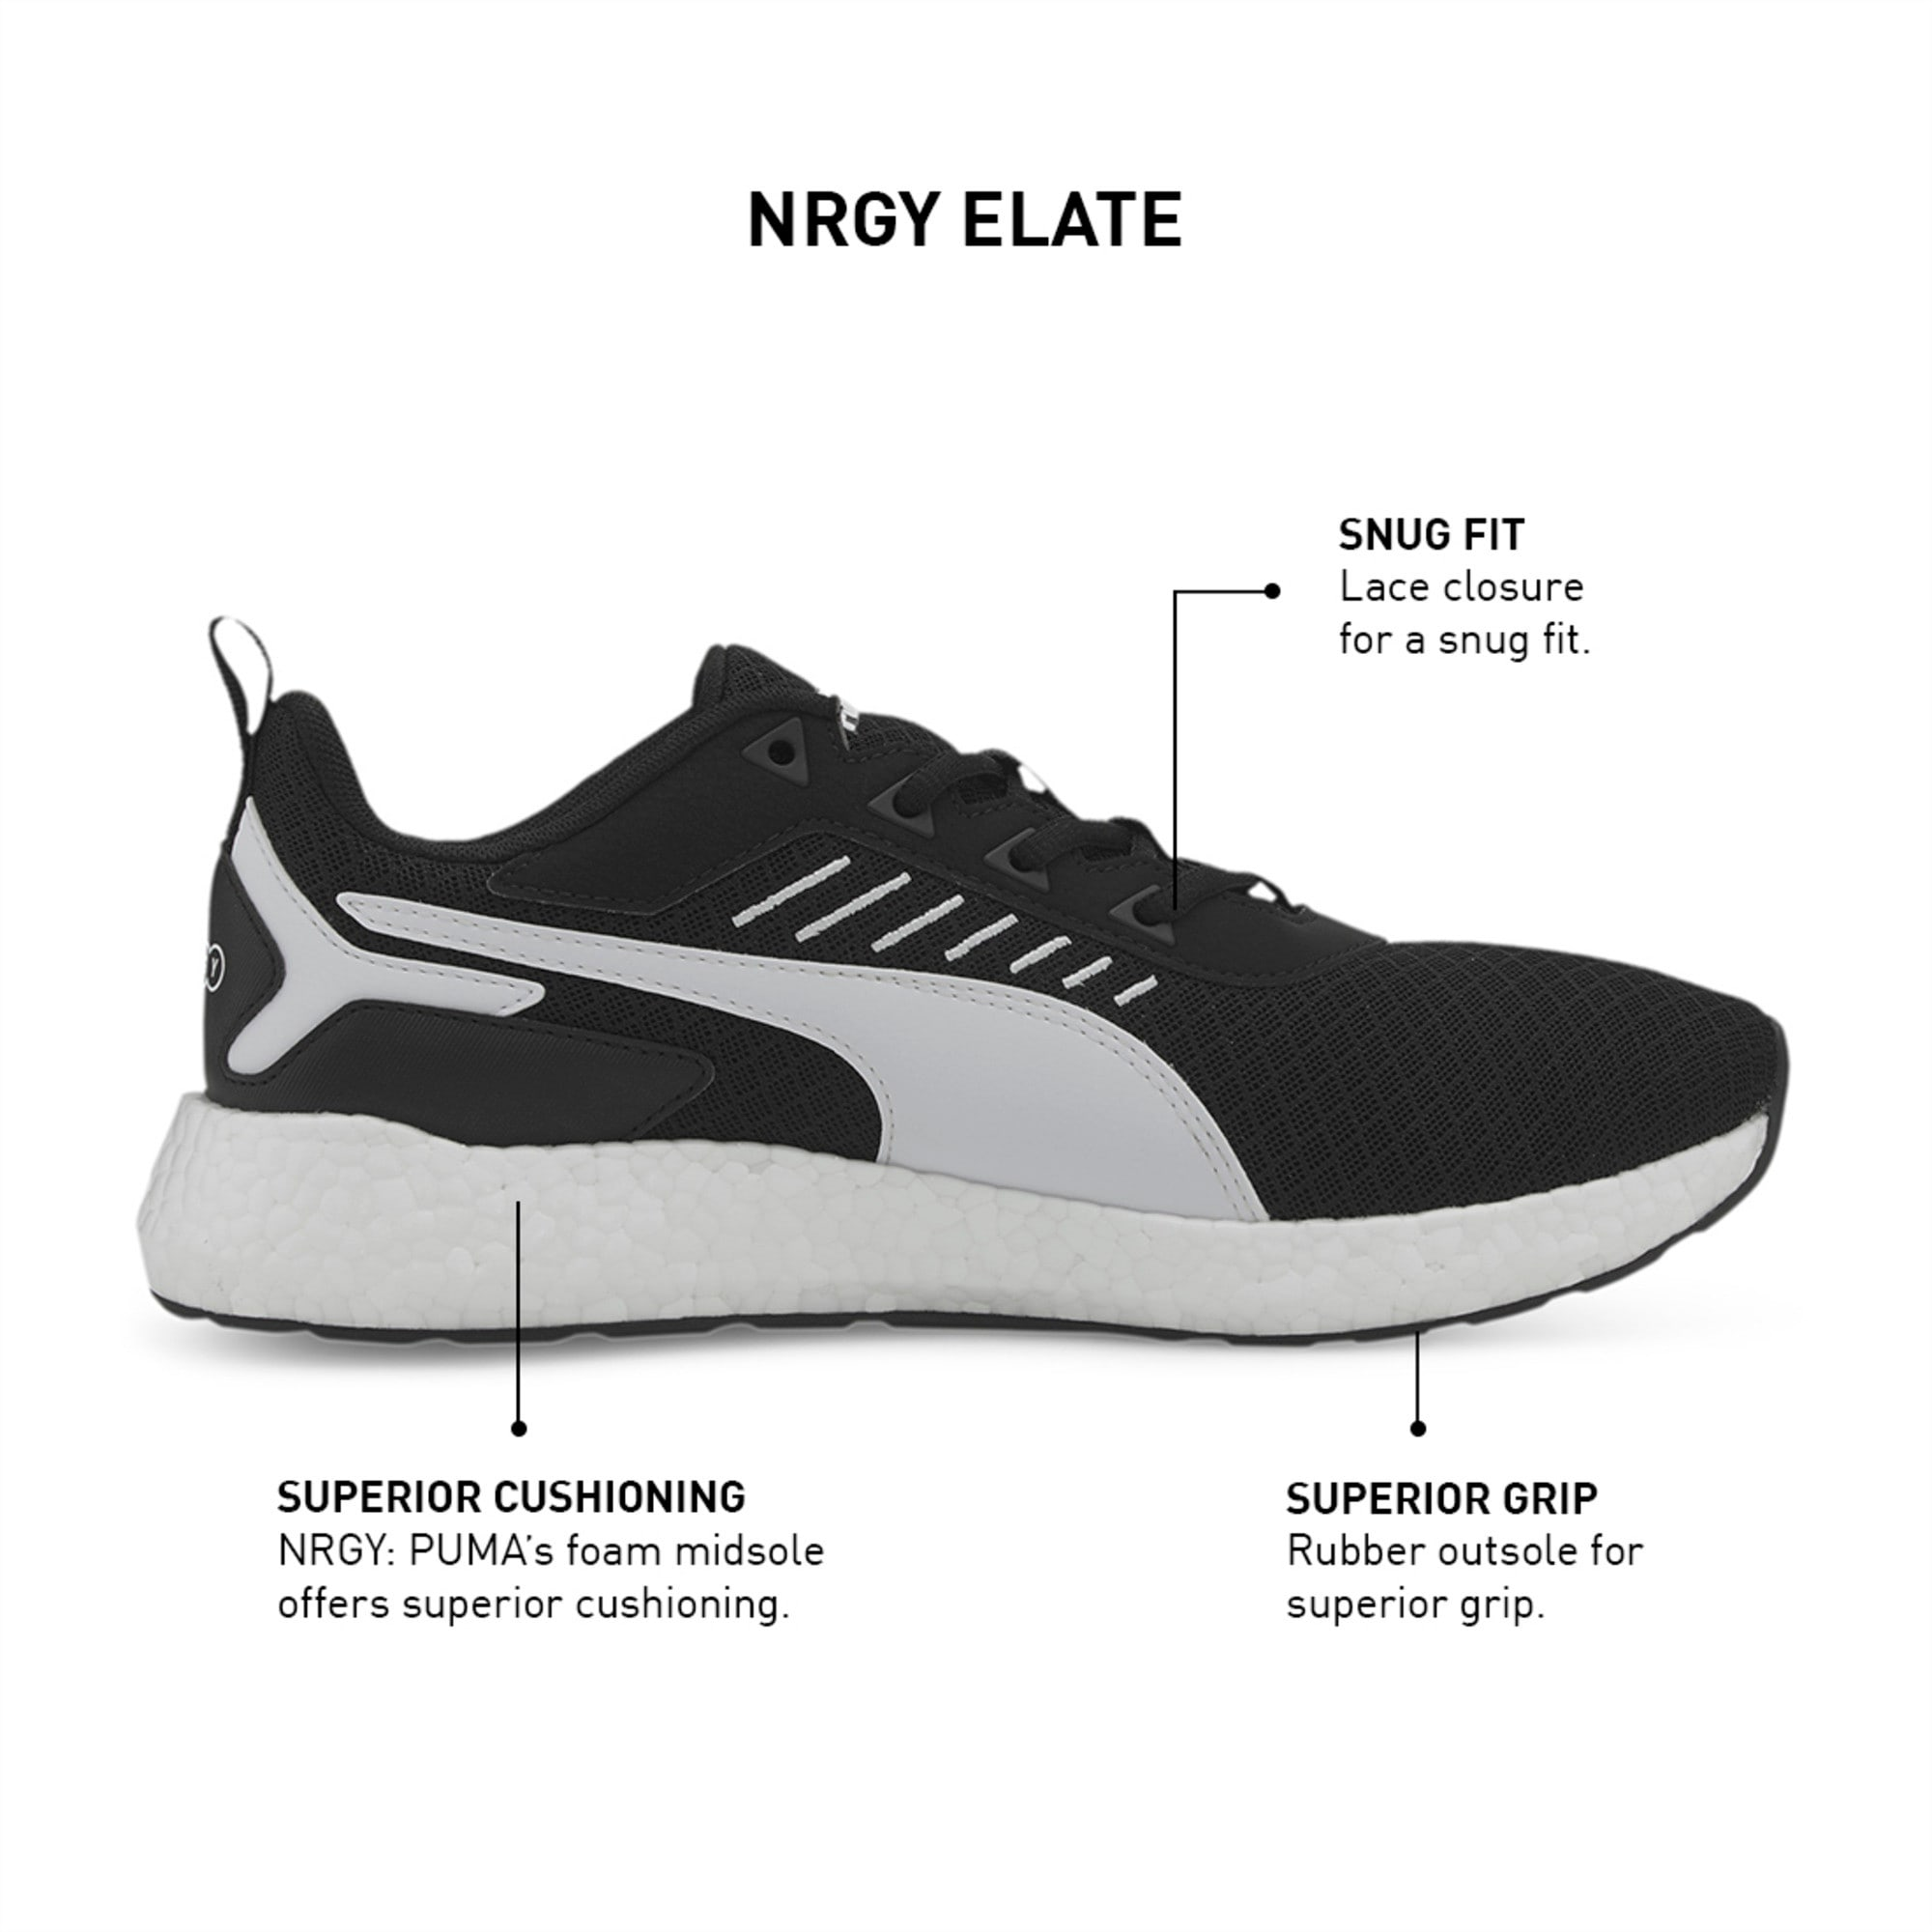 Elate NRGY Men's Running Shoes   Puma Black-Puma White   PUMA Min ...